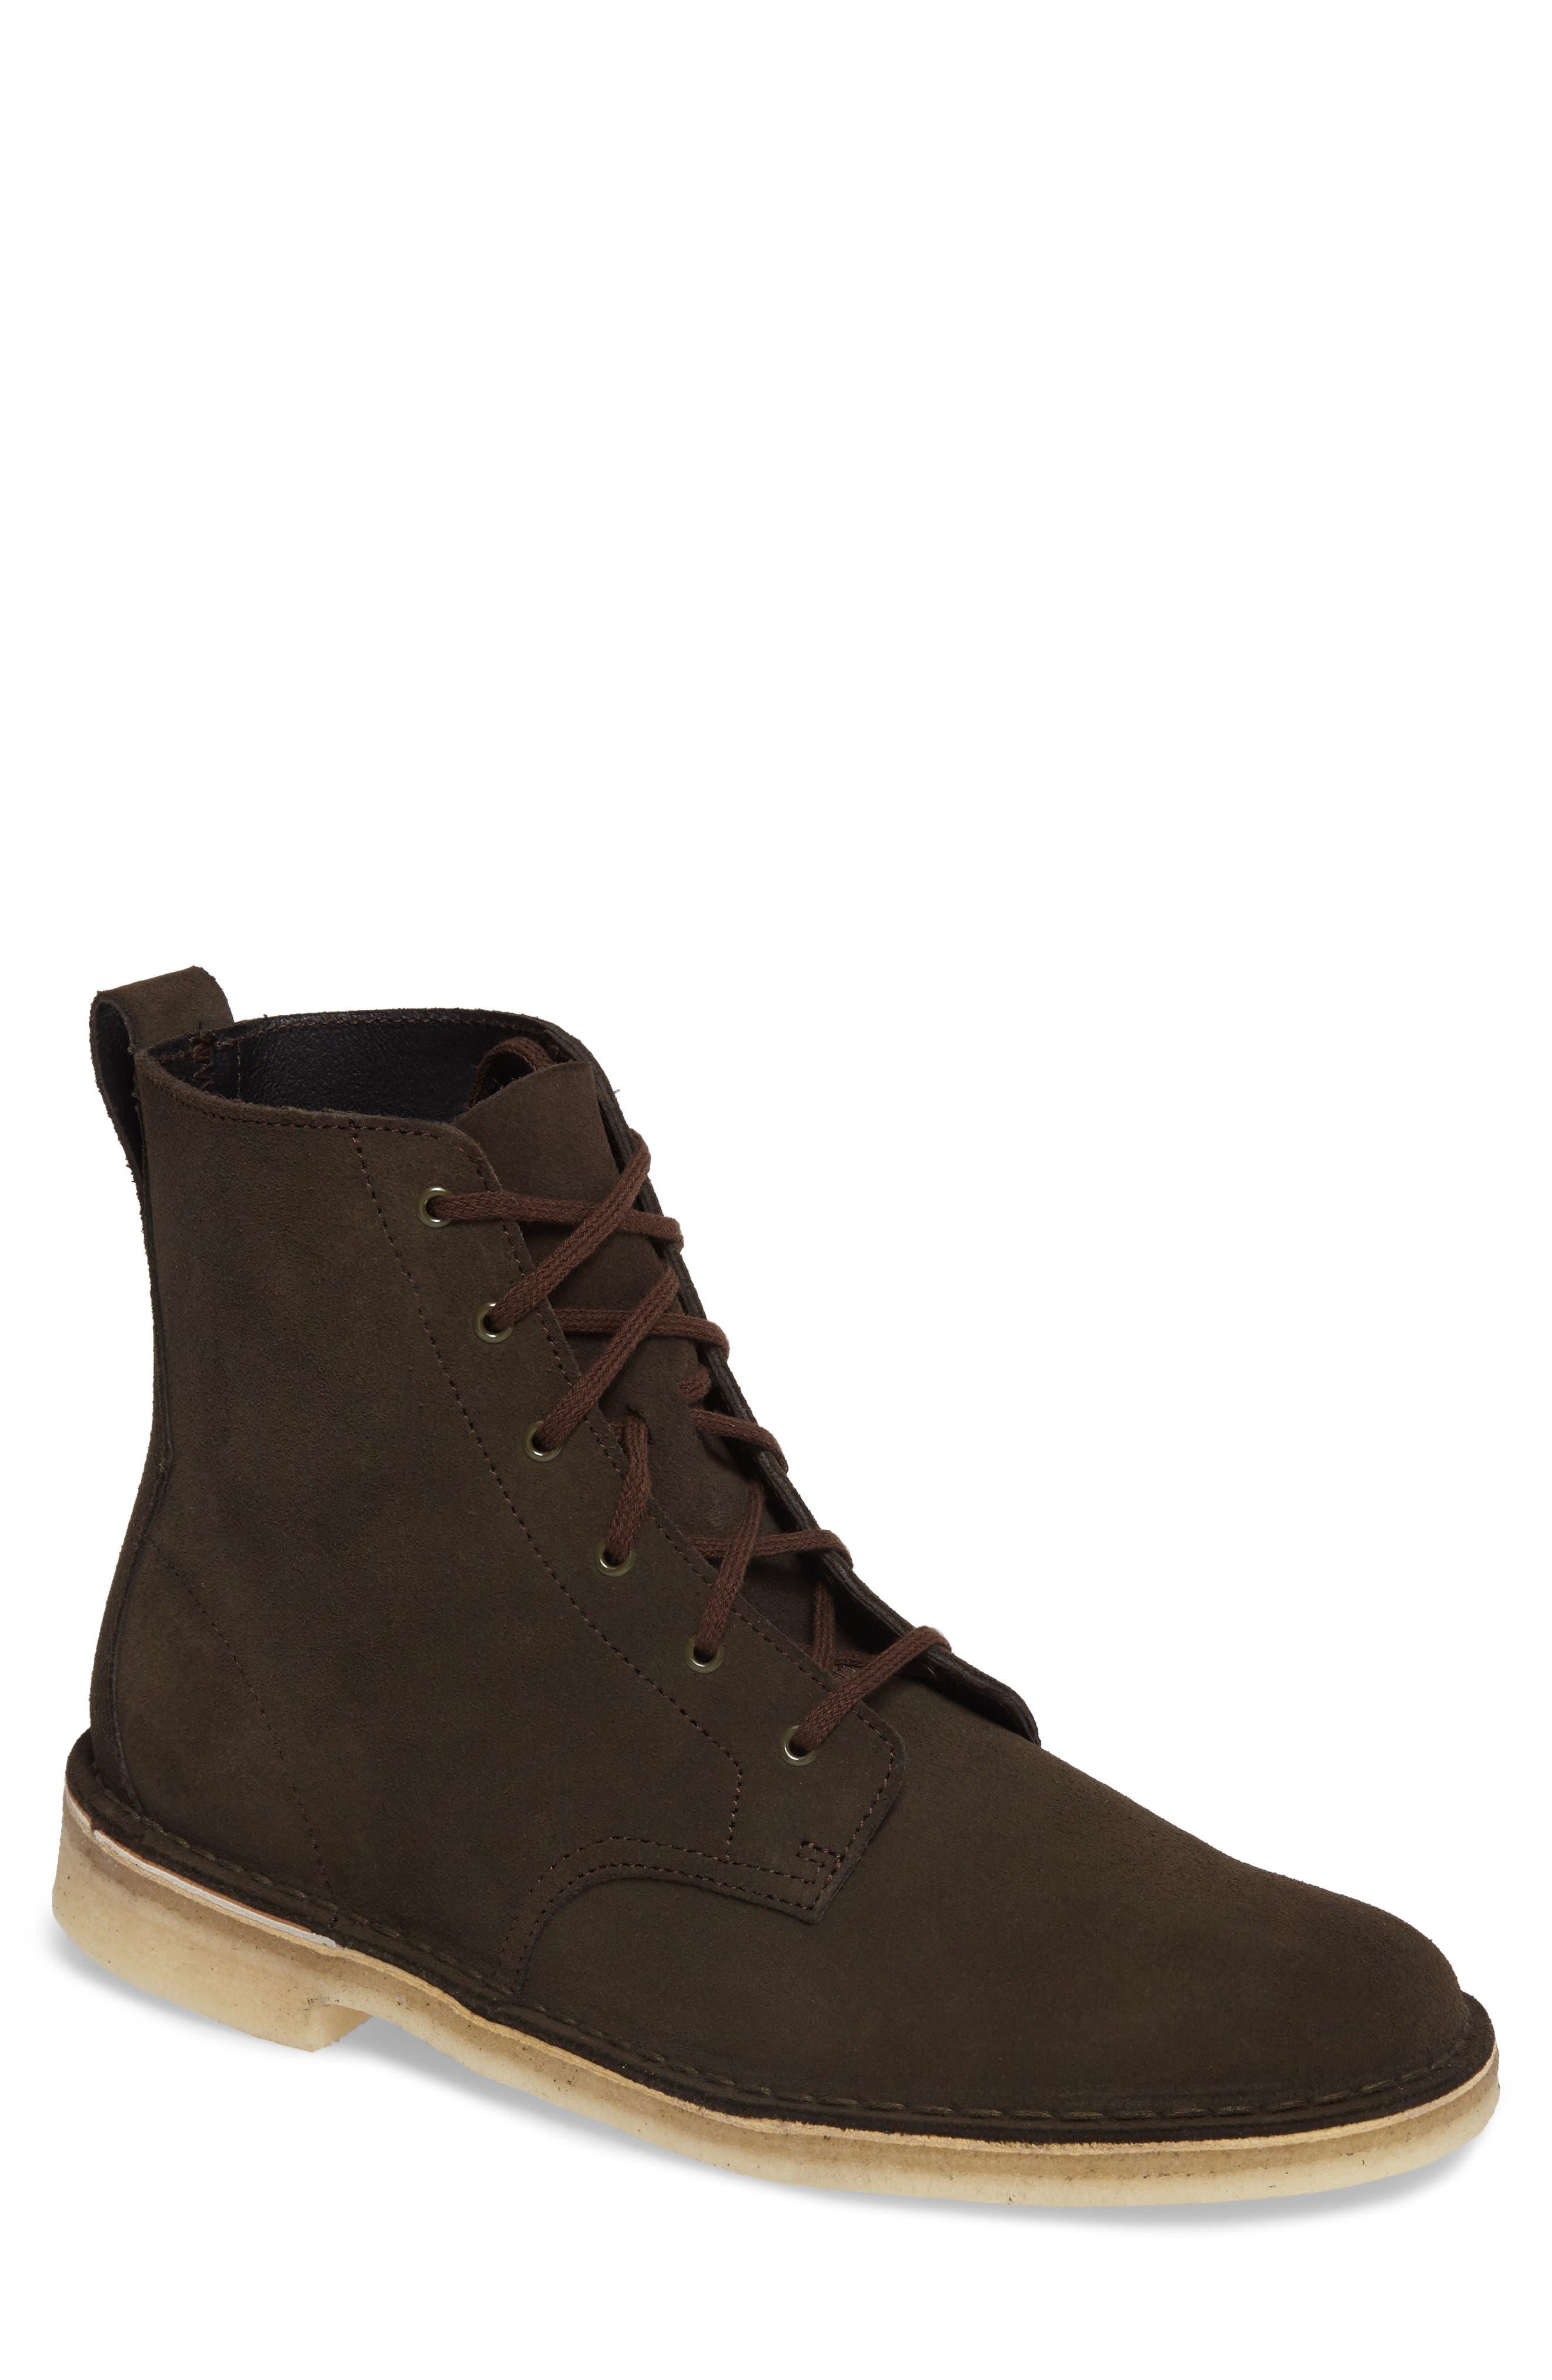 Alternate Image 1 Selected - Clarks® Originals 'Desert Mali' Boot (Men)